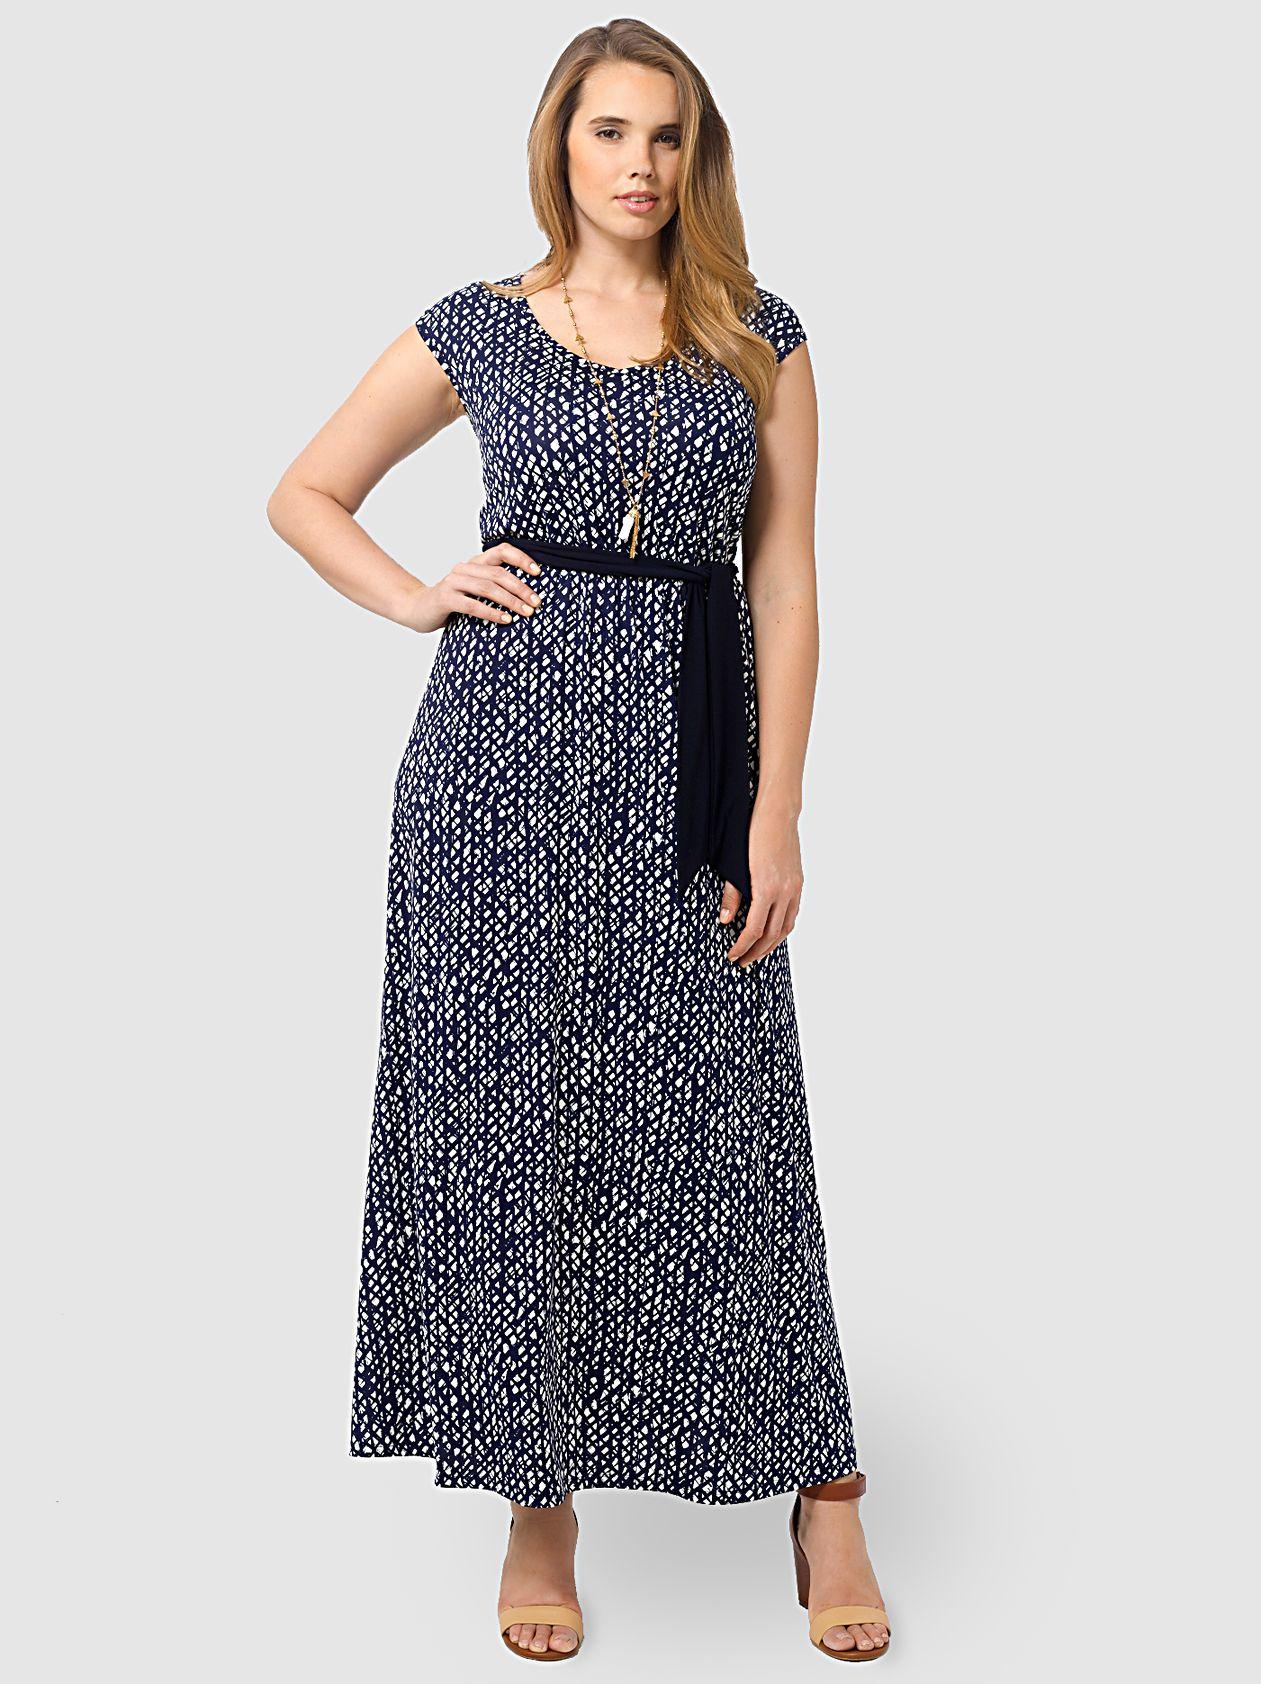 Fantástico Vestidos De Dama Modesta De Talla Grande Viñeta - Vestido ...